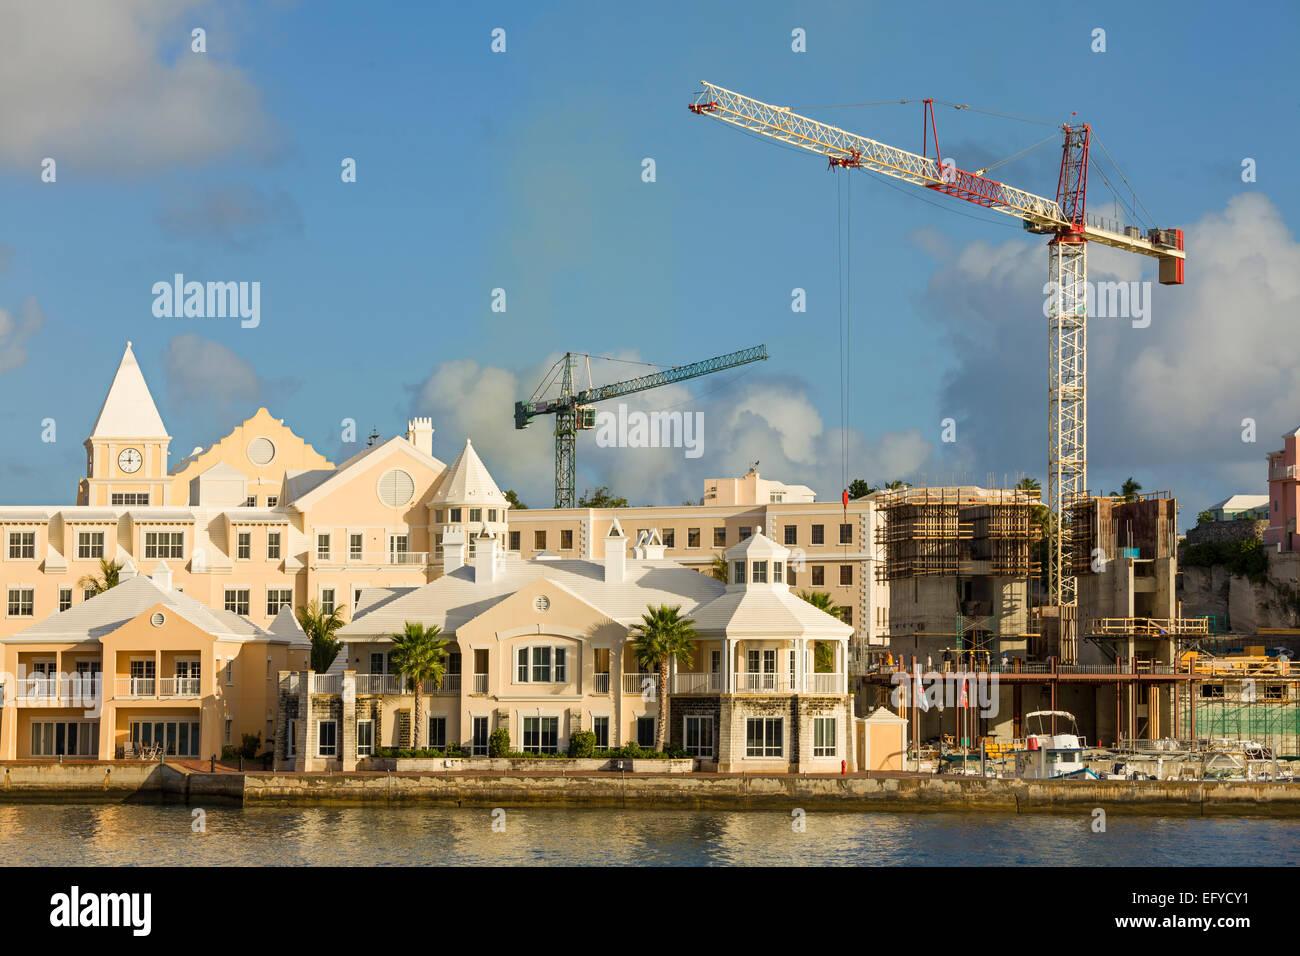 Construction On The Waterfront Of Hamilton Bermuda Stock Photo Alamy